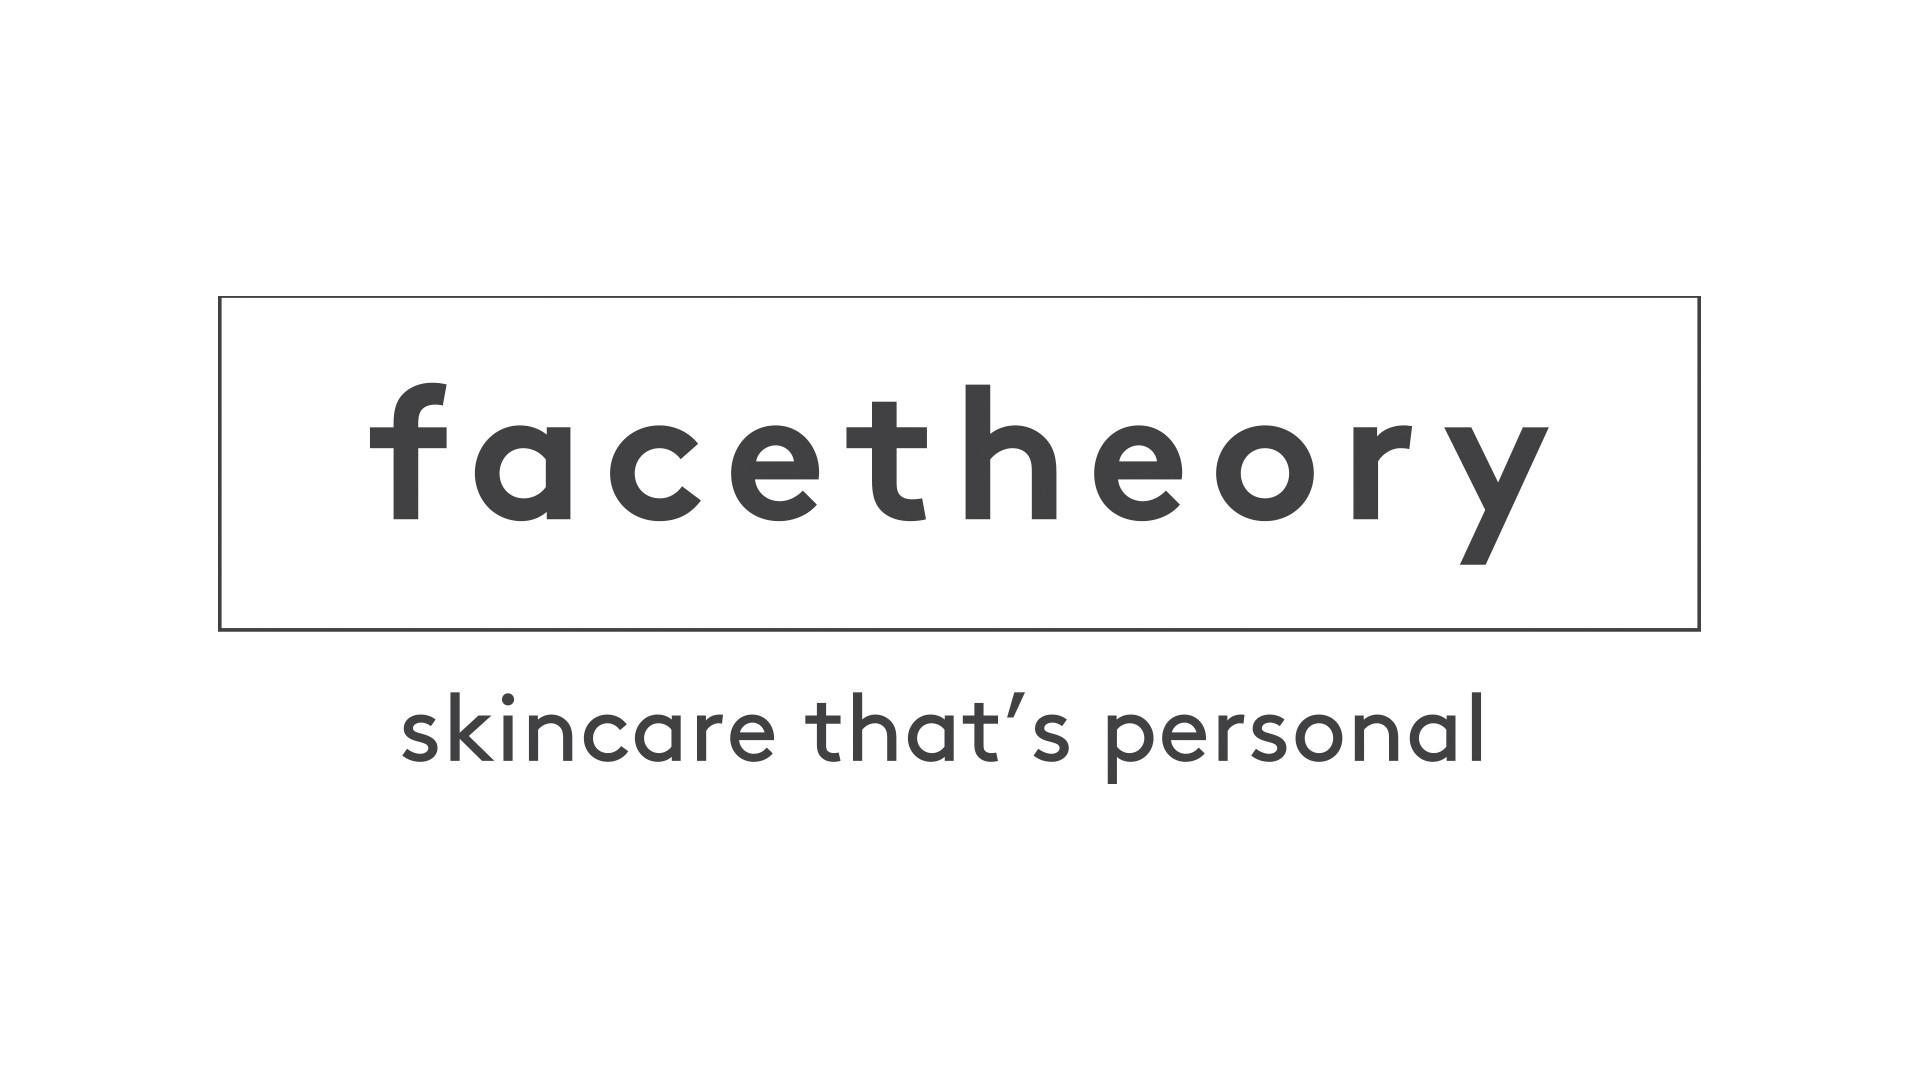 facetheory.jpg